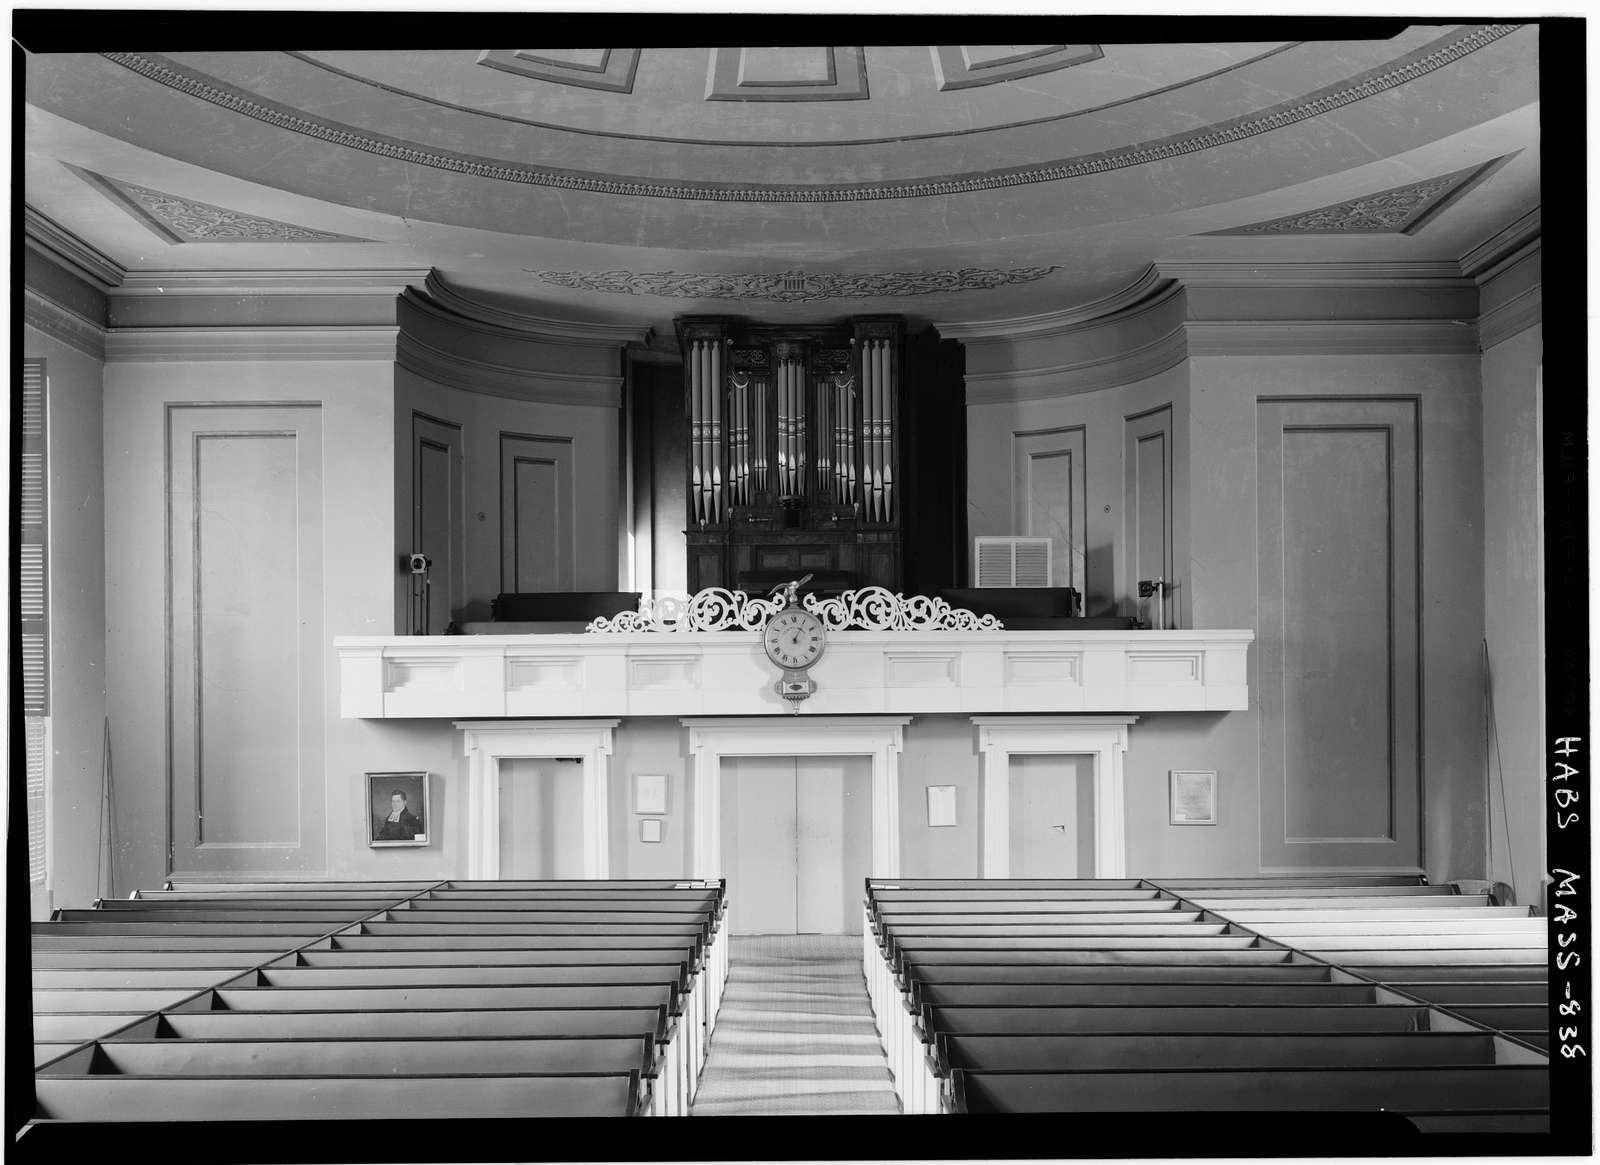 Second Congregational Meetinghouse Society Church, Orange Street, Nantucket, Nantucket County, MA